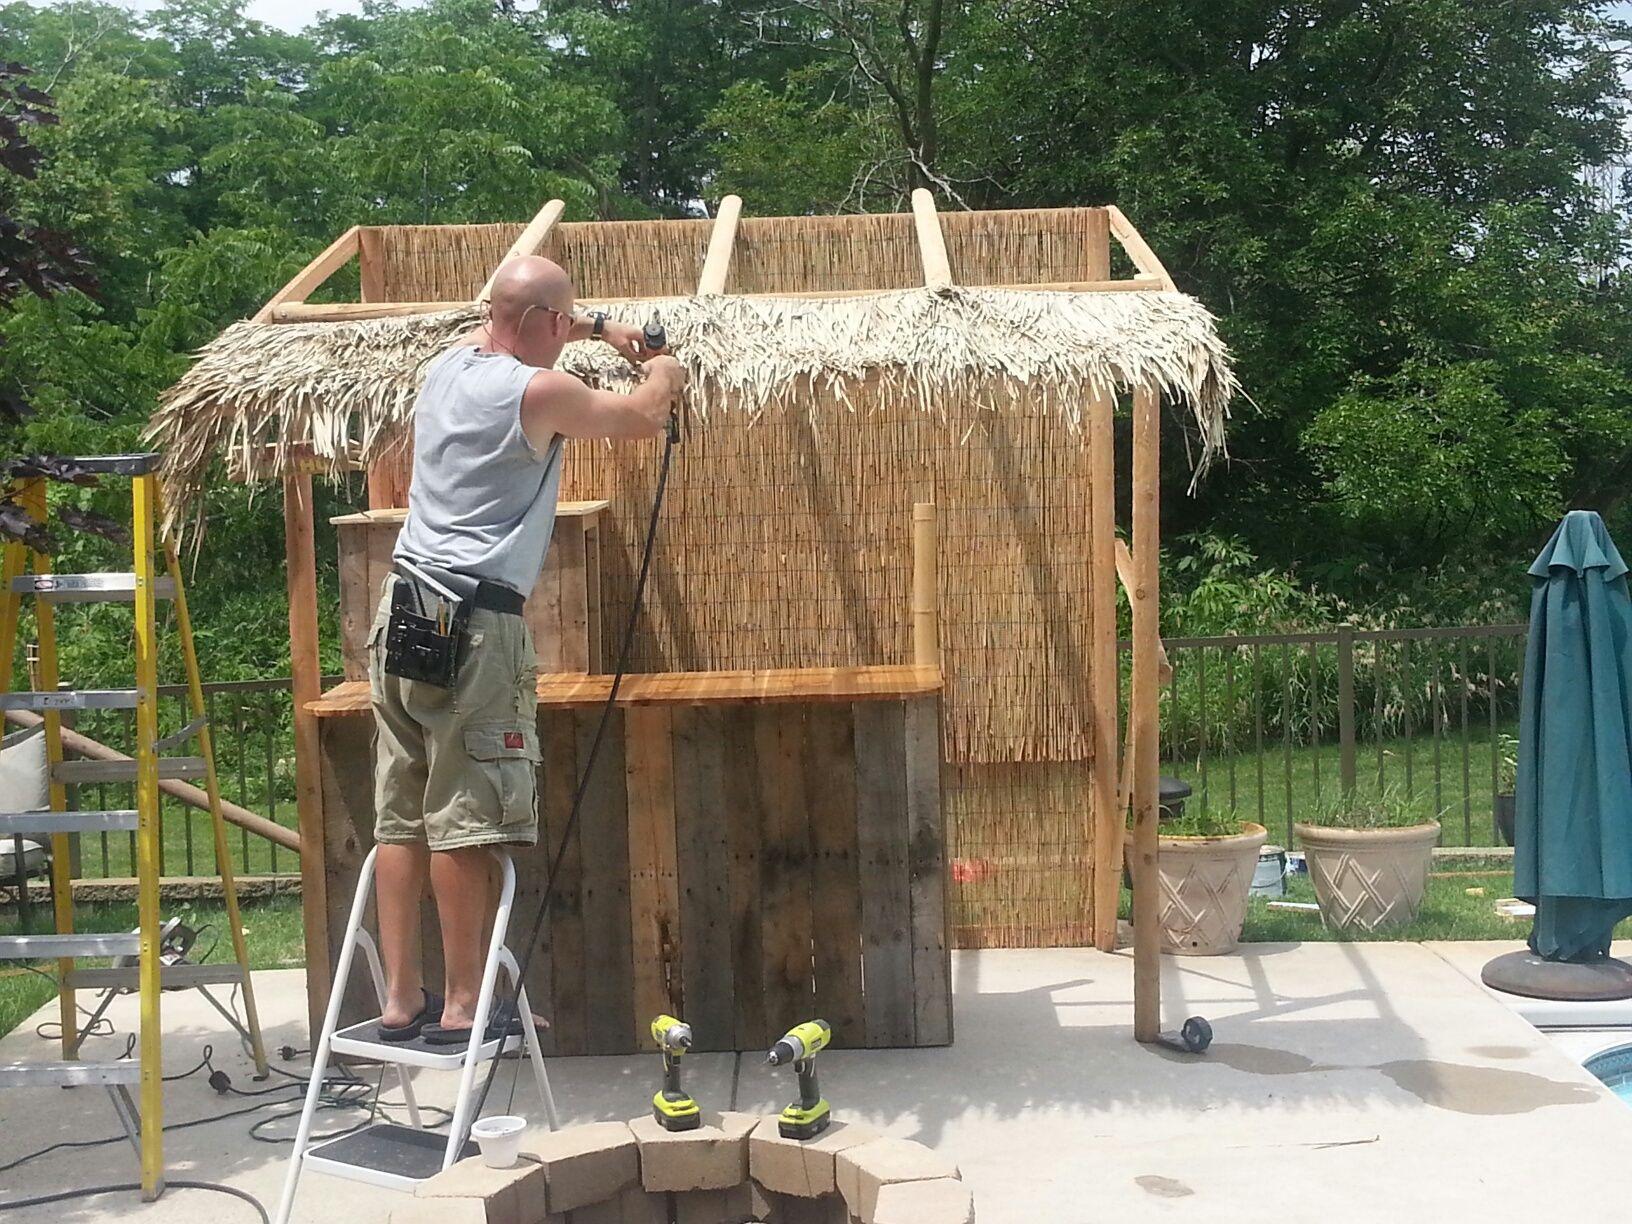 Make your own outdoor tiki bar More | Outdoor tiki bar ... on Tiki Bar Designs For Backyard id=17429